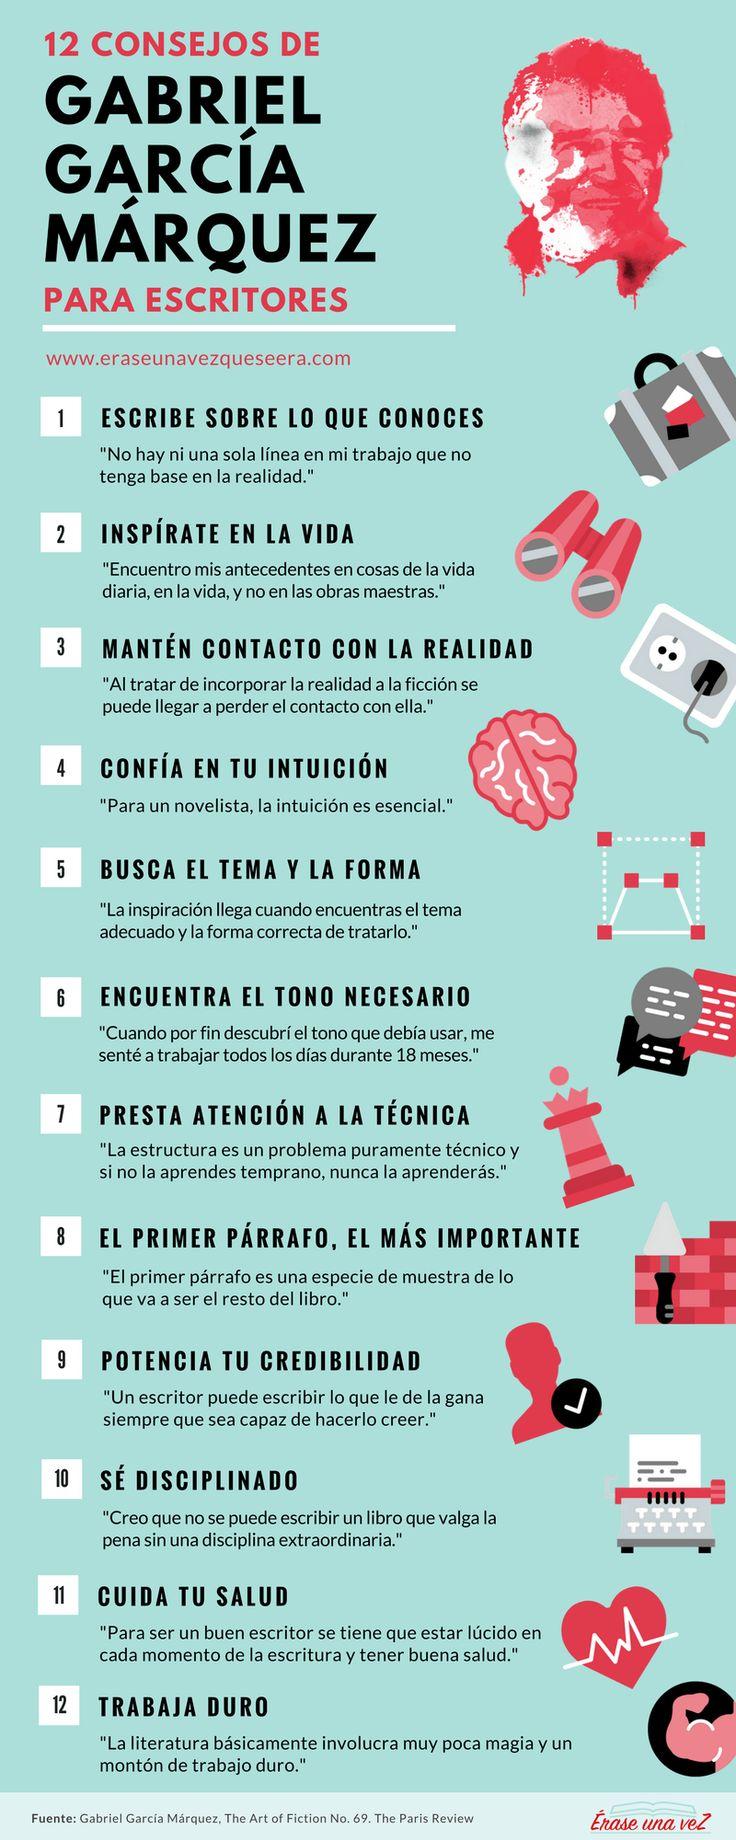 best ideas about gabriel garcia marquez garcia infografiacutea 12 consejos de gabriel garciacutea maacuterquez para escritores